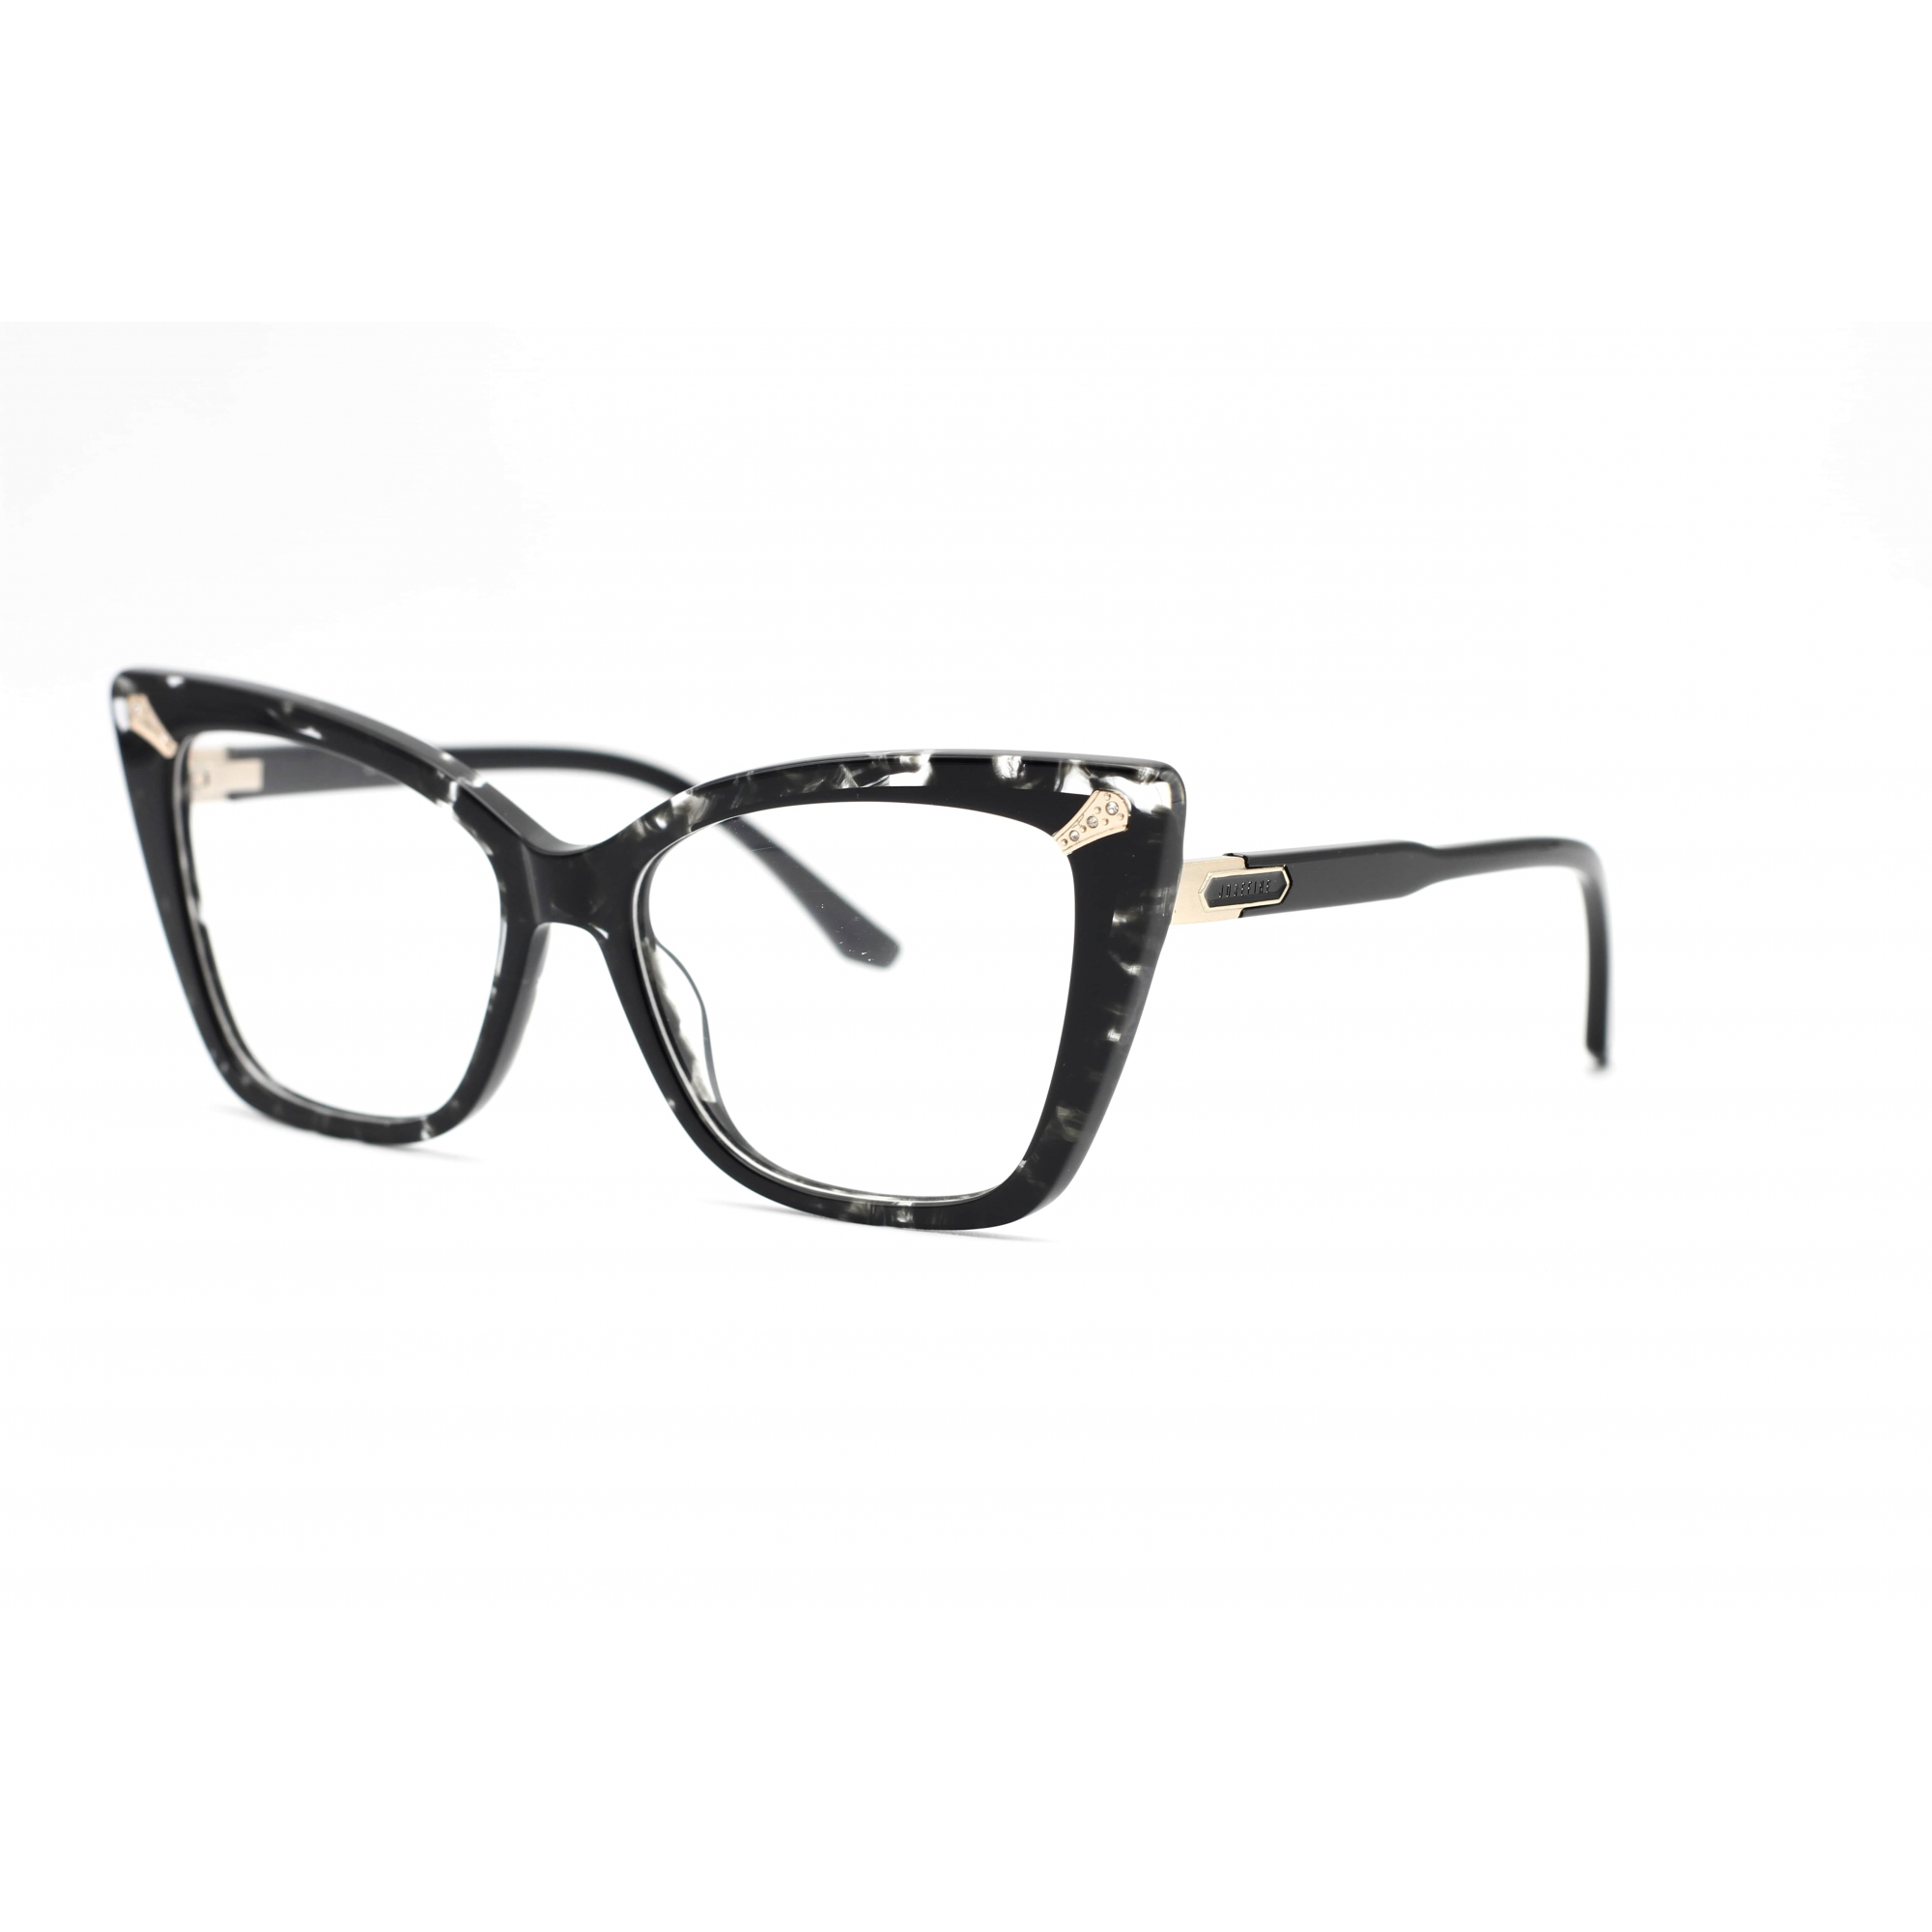 Armação para óculos Josefine MB4628 C1 54